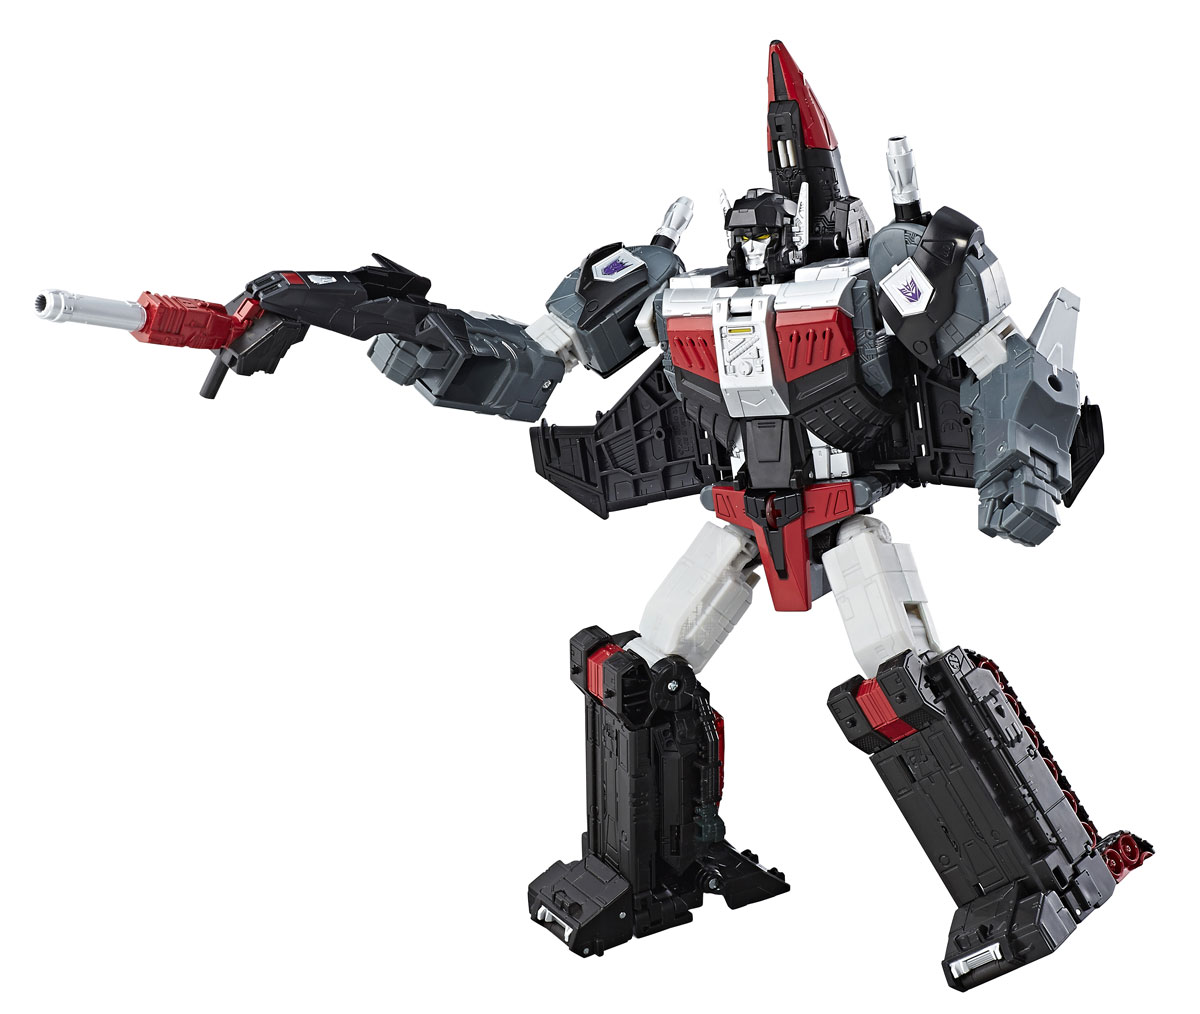 Transformers Трансформер Ominus & Sky Shadow transformers трансформер thermidor